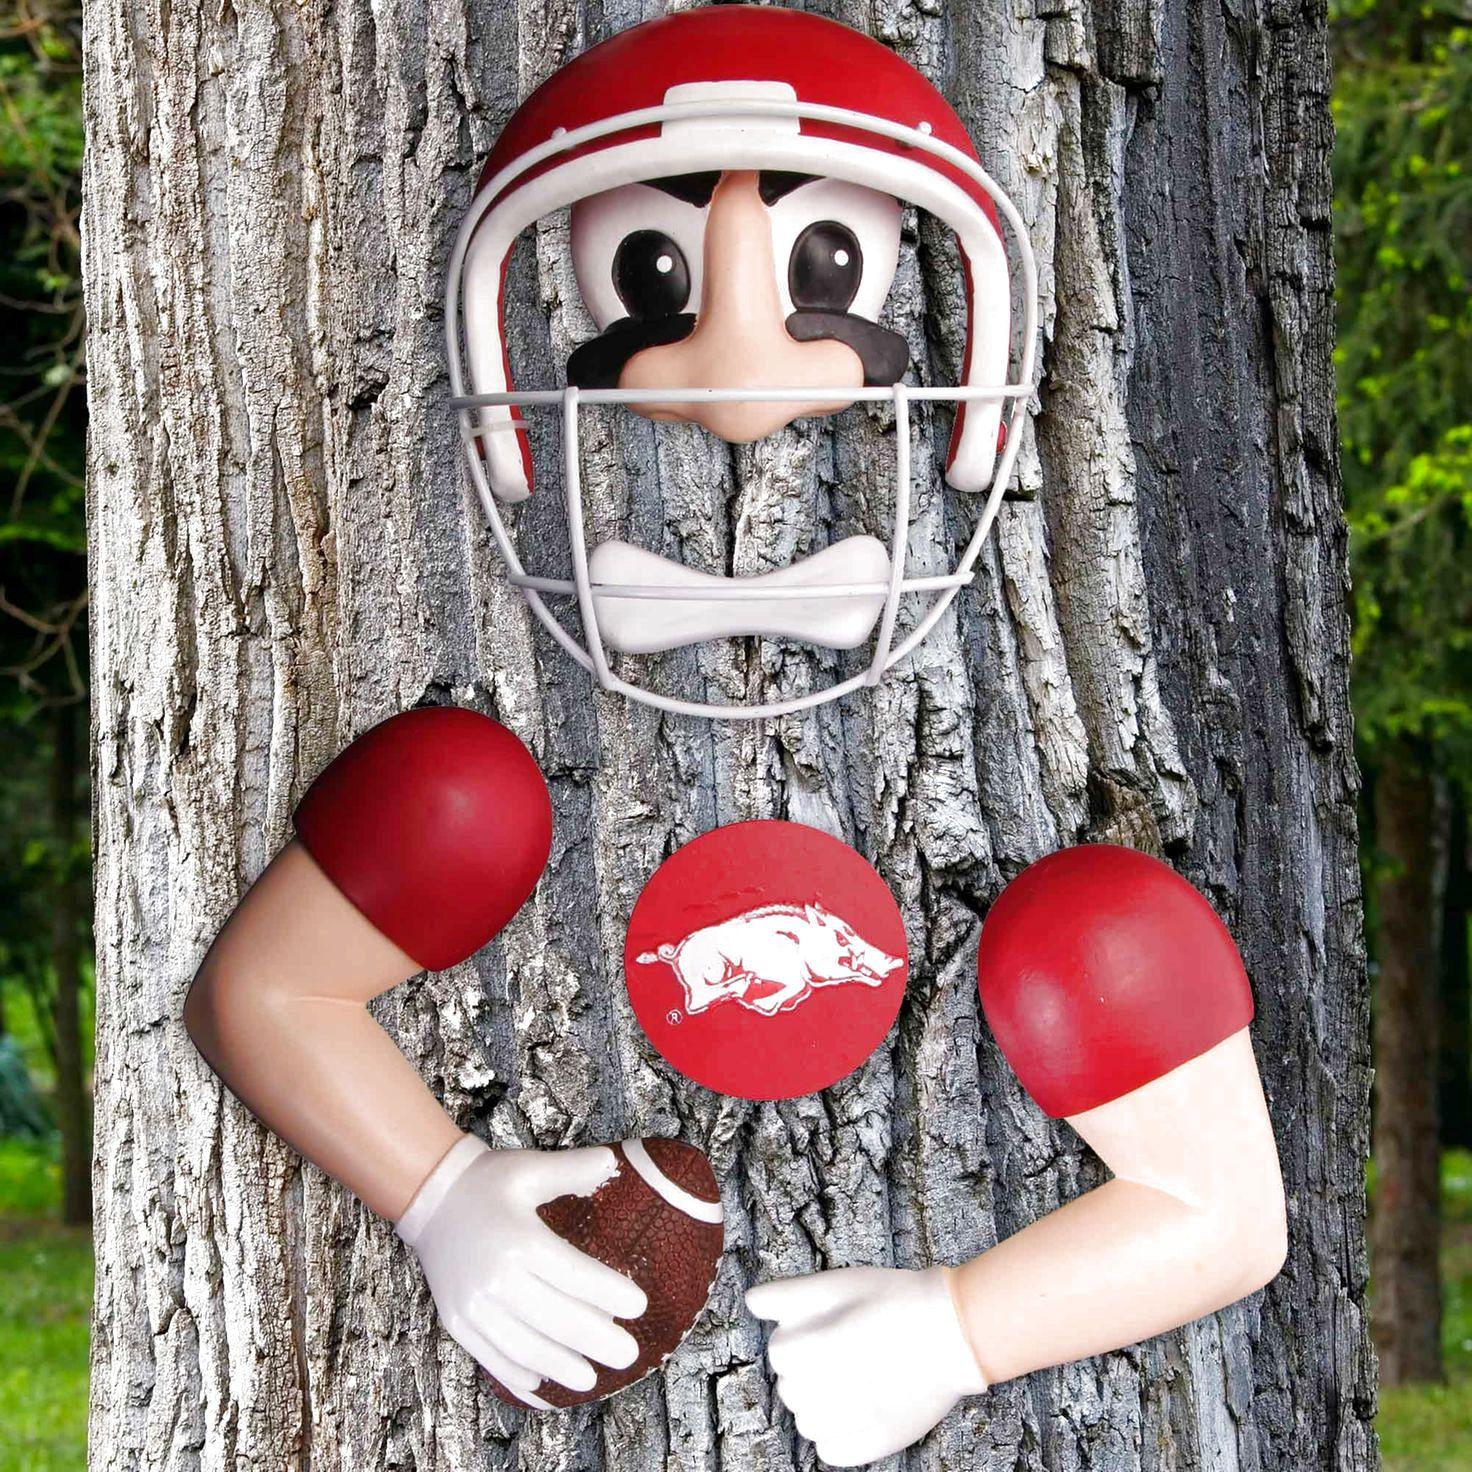 Arkansas Razorbacks Player Tree Face - $18.04